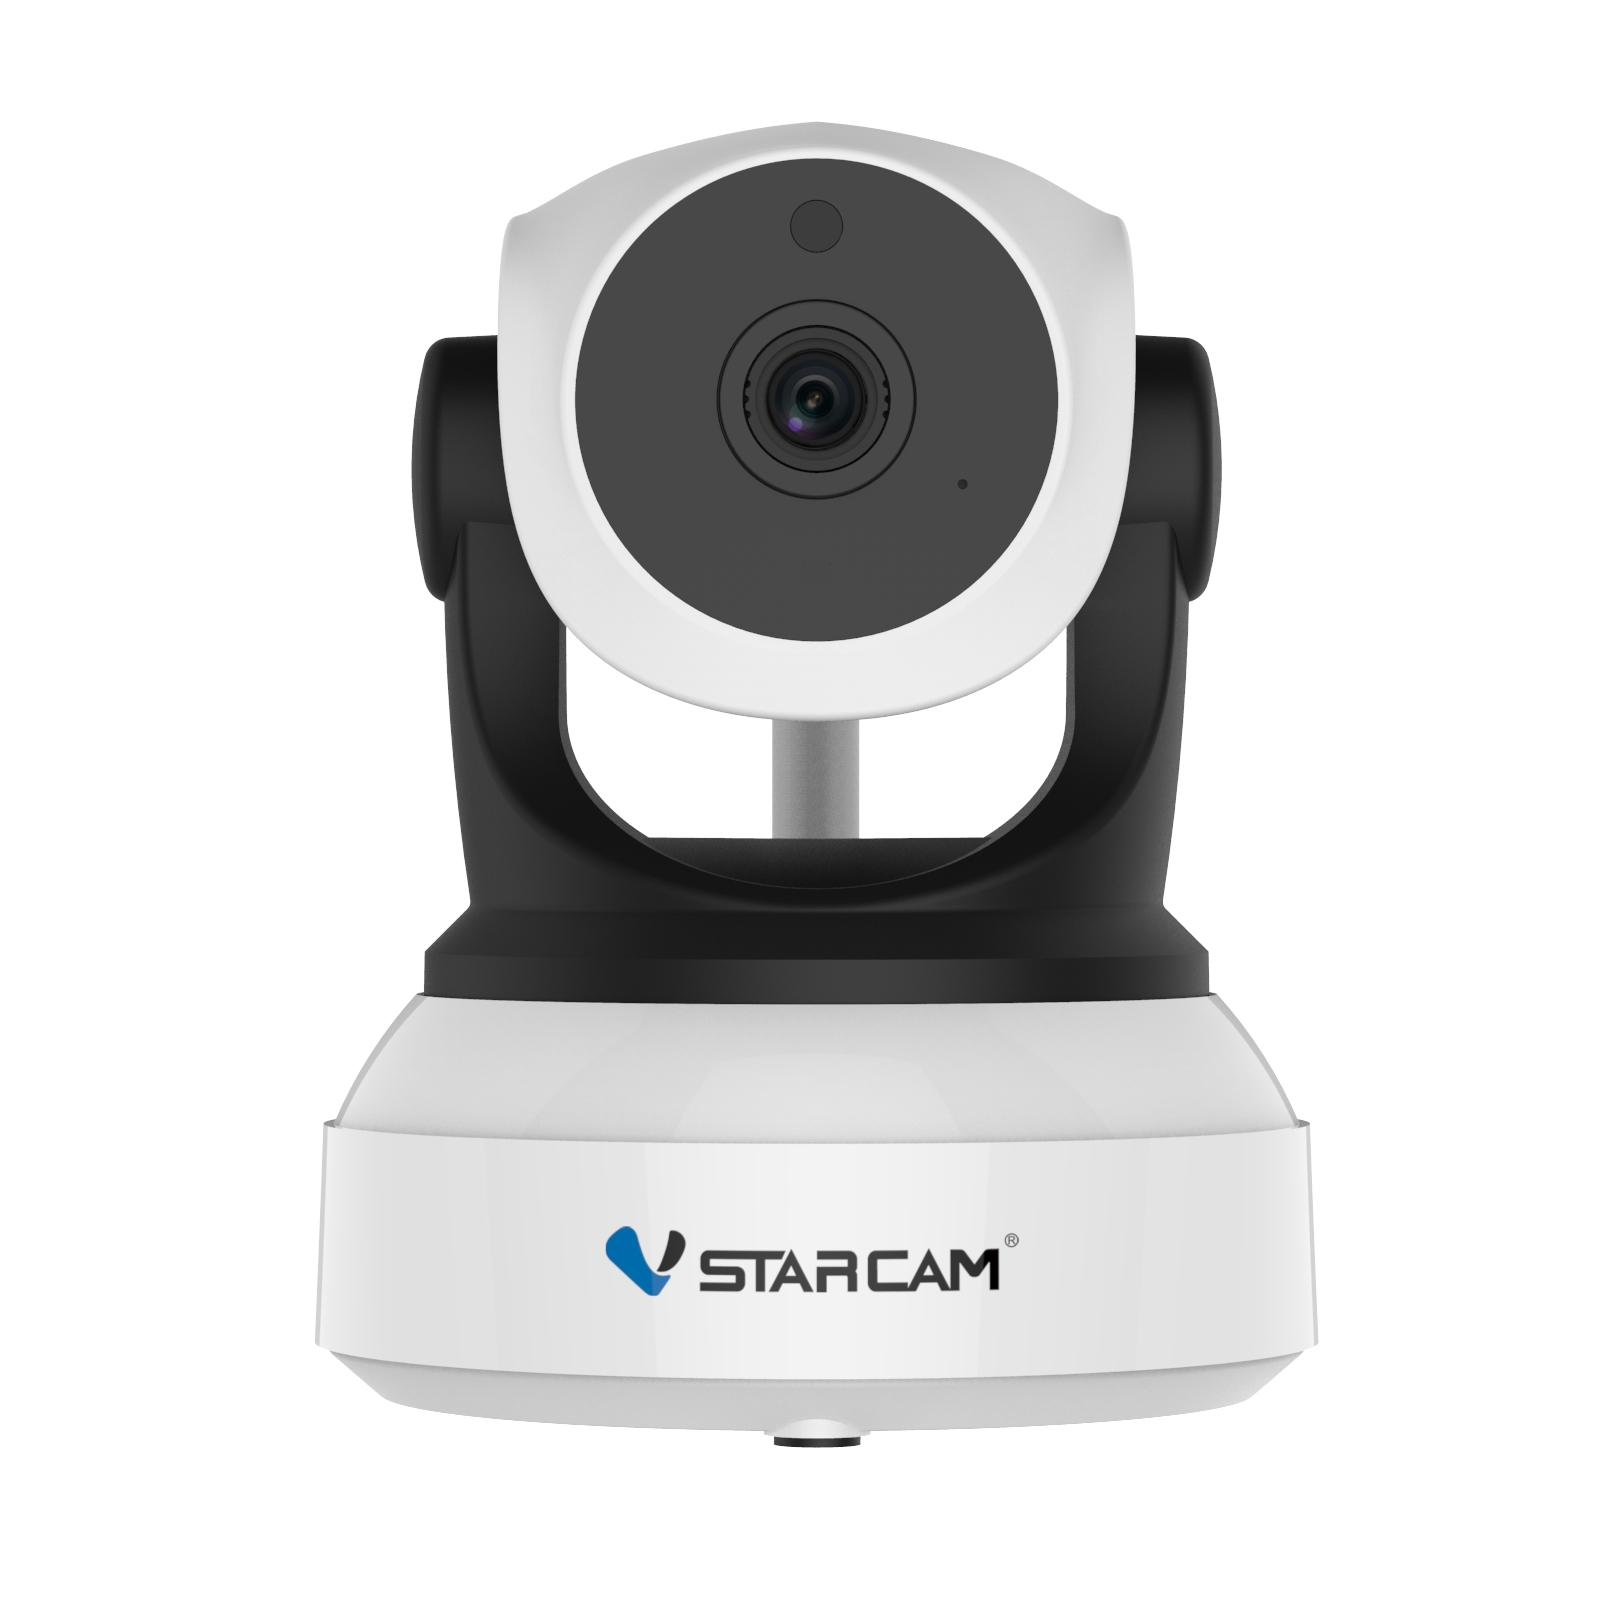 VStarcam C24S 200万像素网络摄像机 1